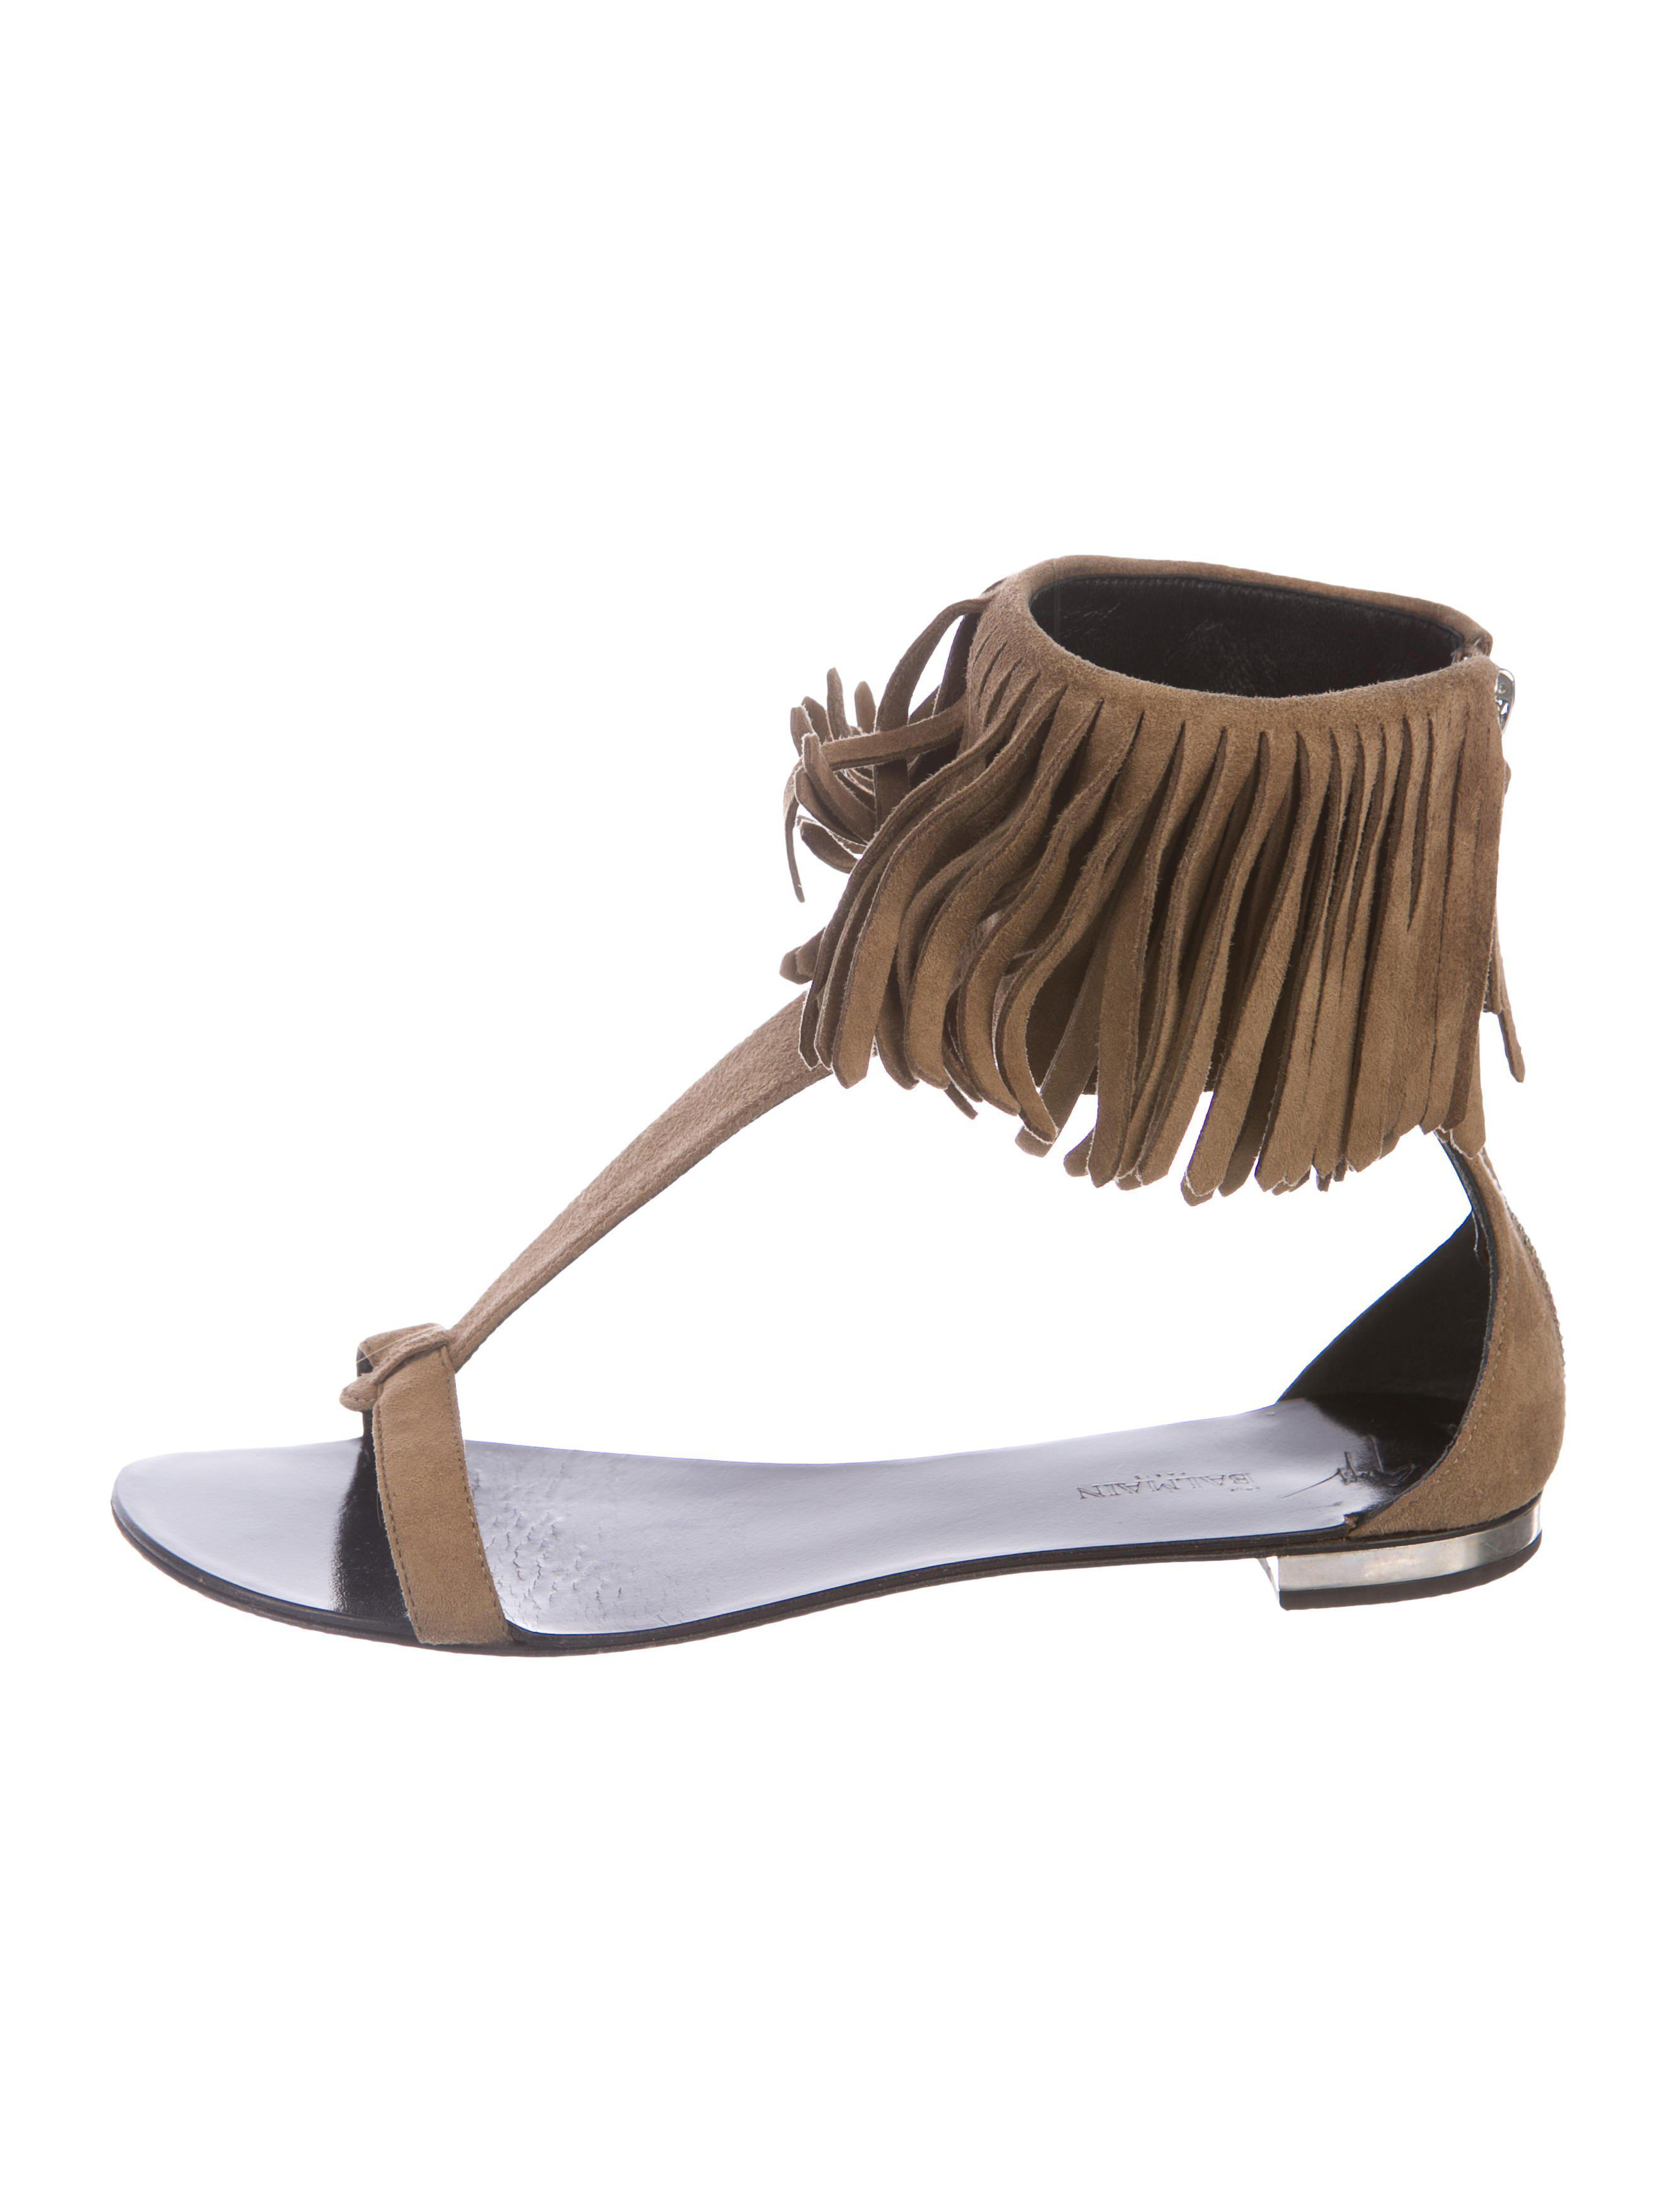 Flat shoes suede suede Fringe Logo Strass black gold Giuseppe Zanotti mzTvf